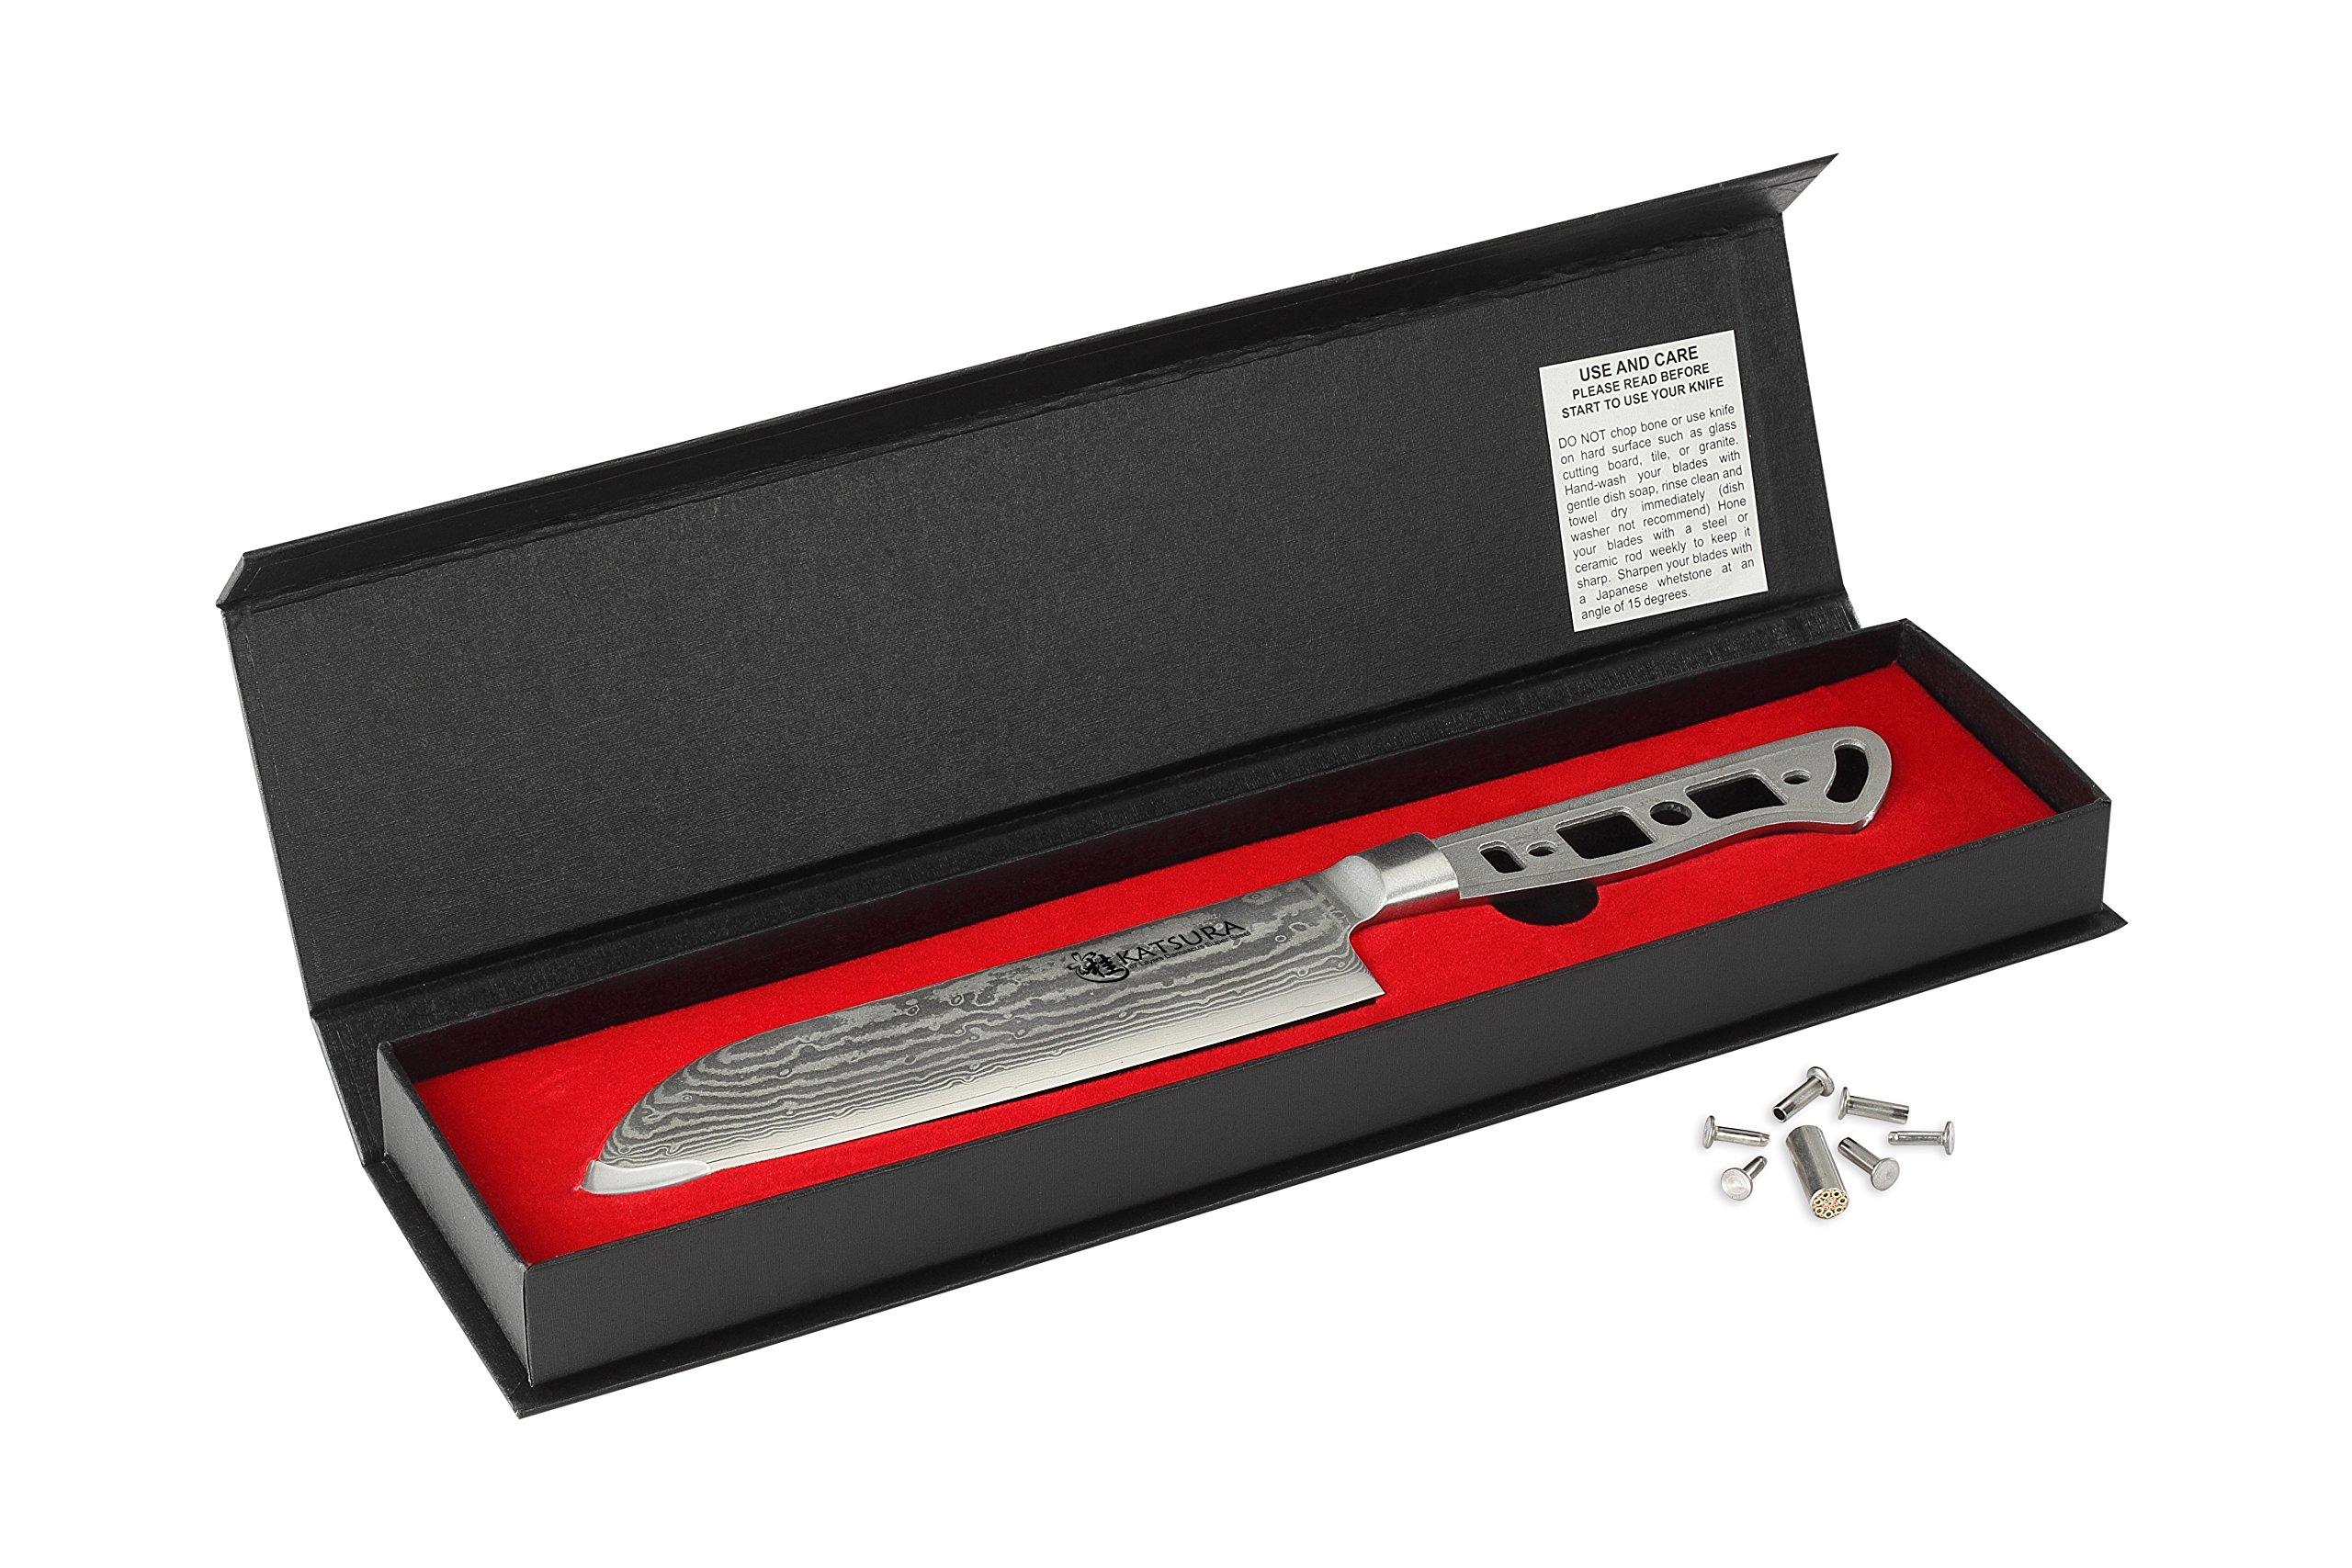 KATSURA Woodworker Project kit - Premium AUS 10 67 Layers Damascus steel - 7 inch Santoku Knife kit blank - Nice gift box